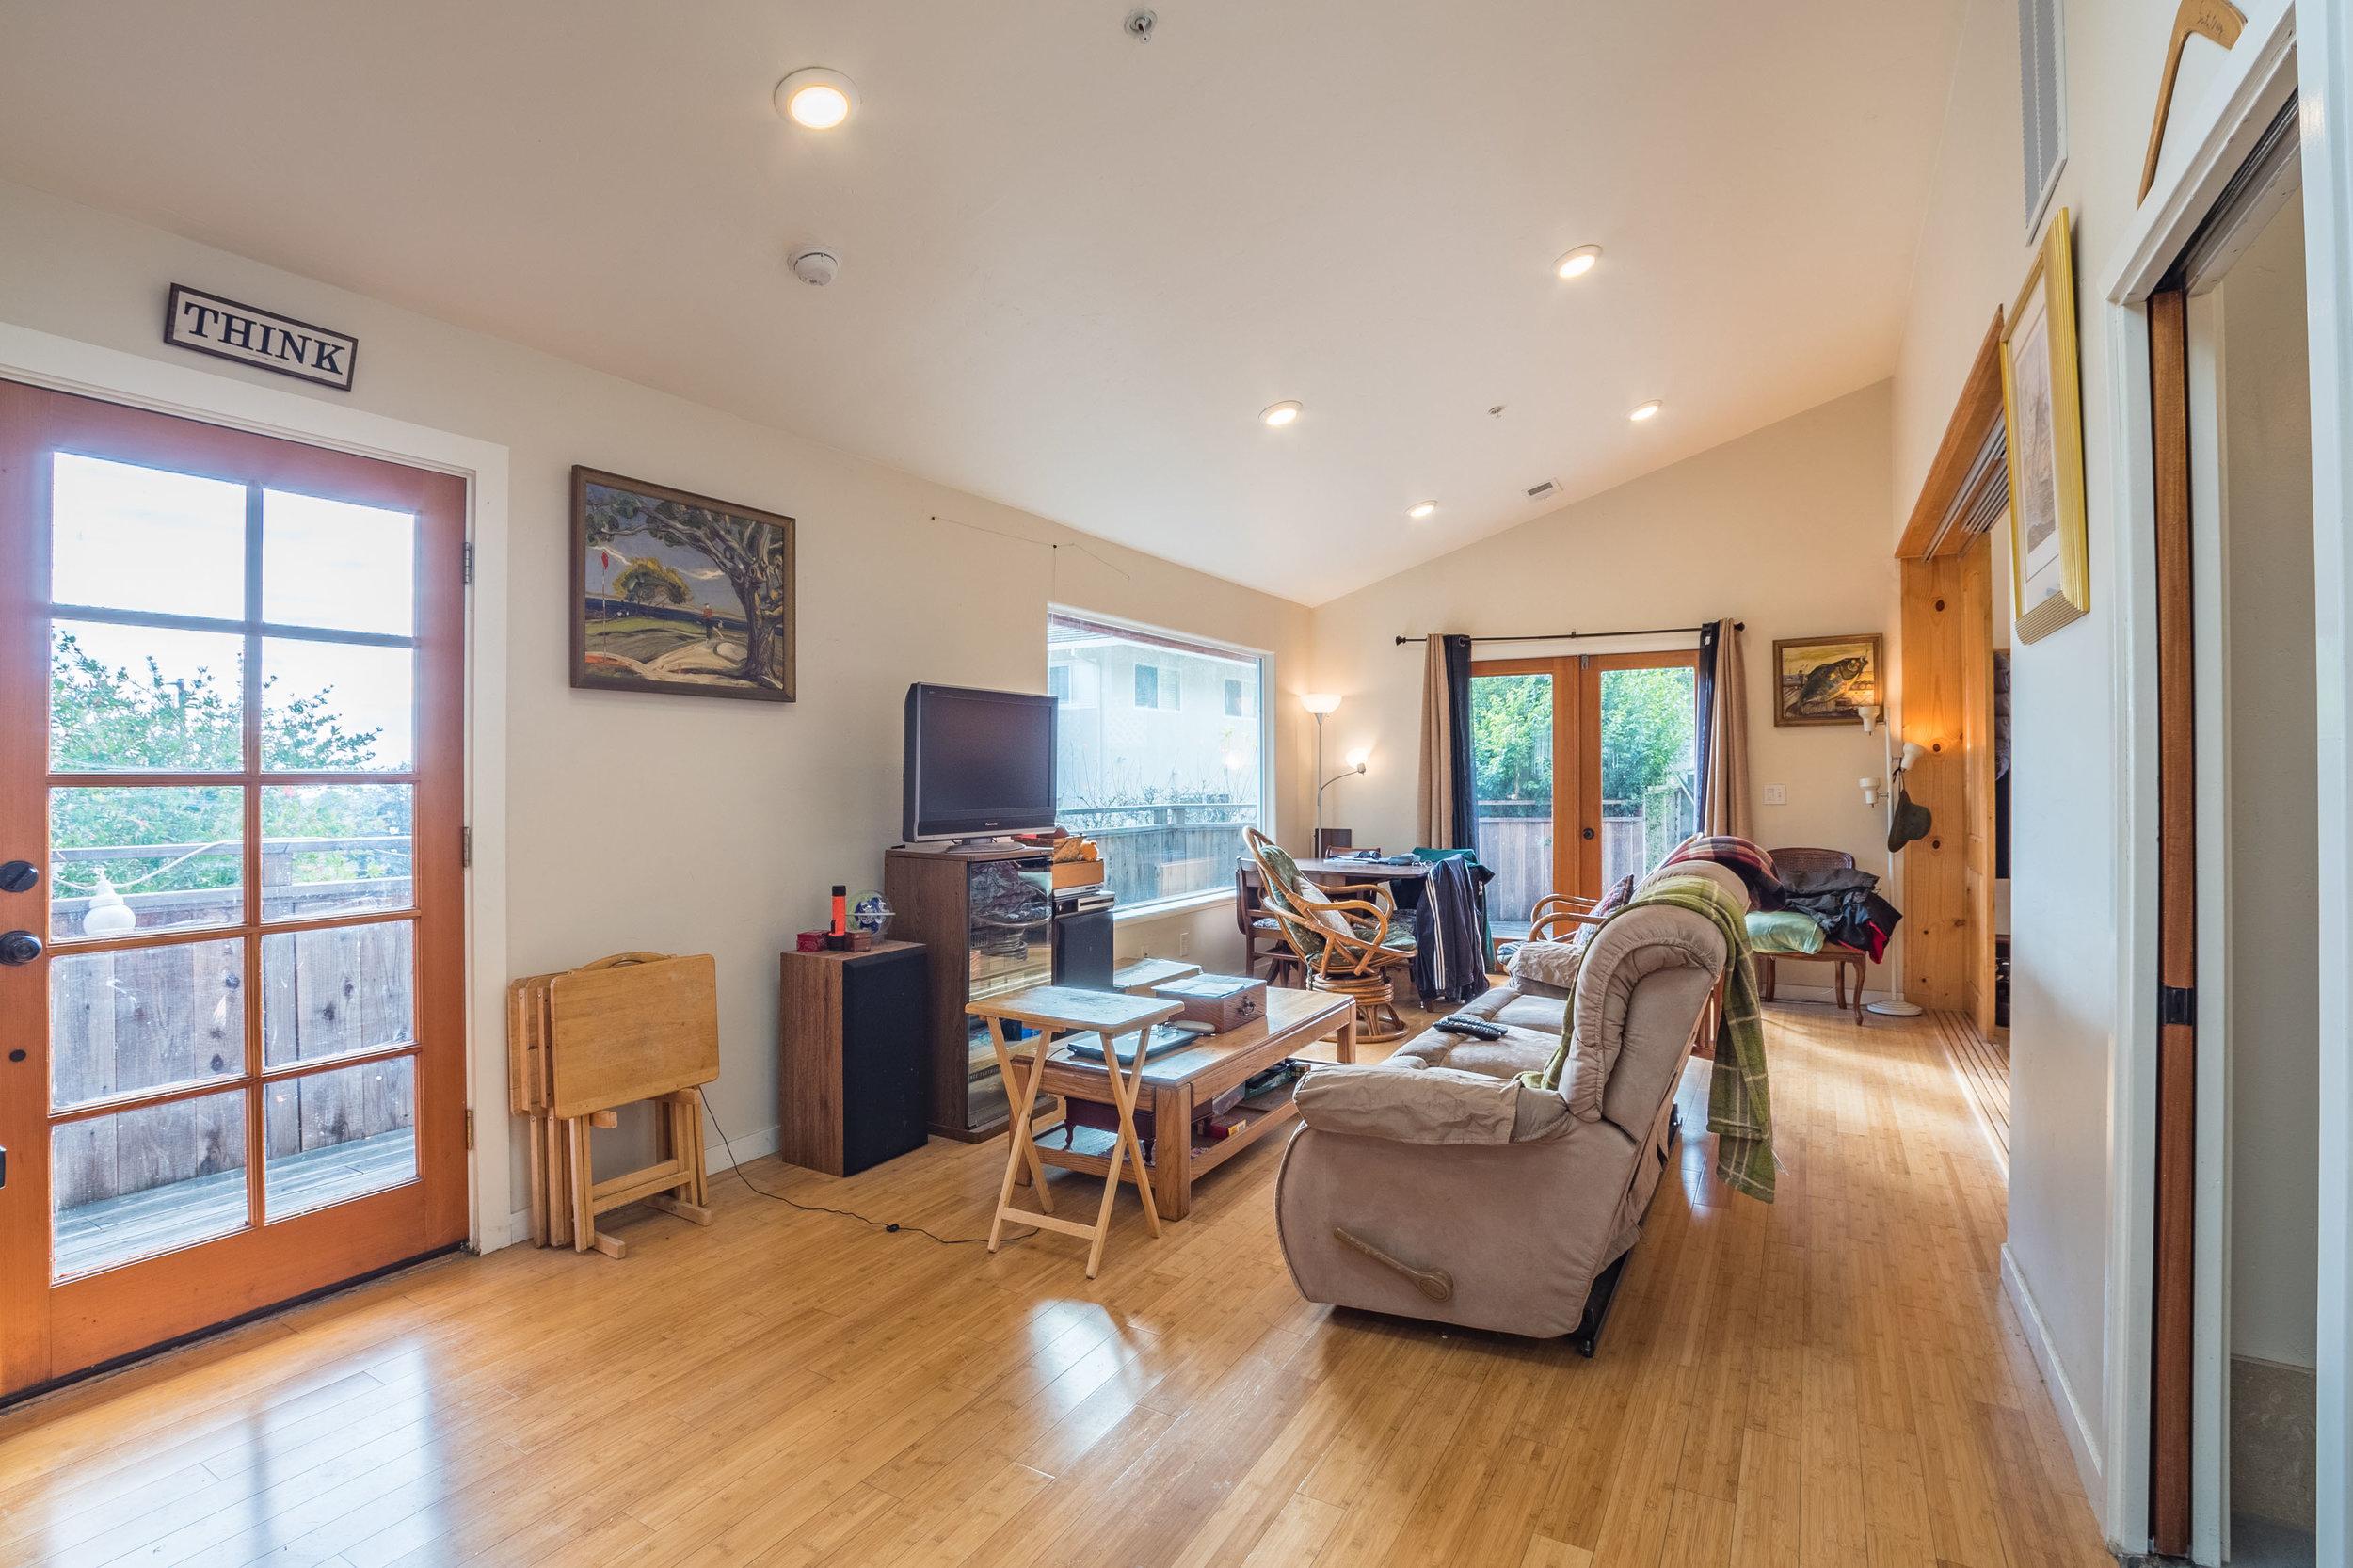 Real Estate Agents In Santa Cruz 3 Bedroom & 2 Bathroom Home + L